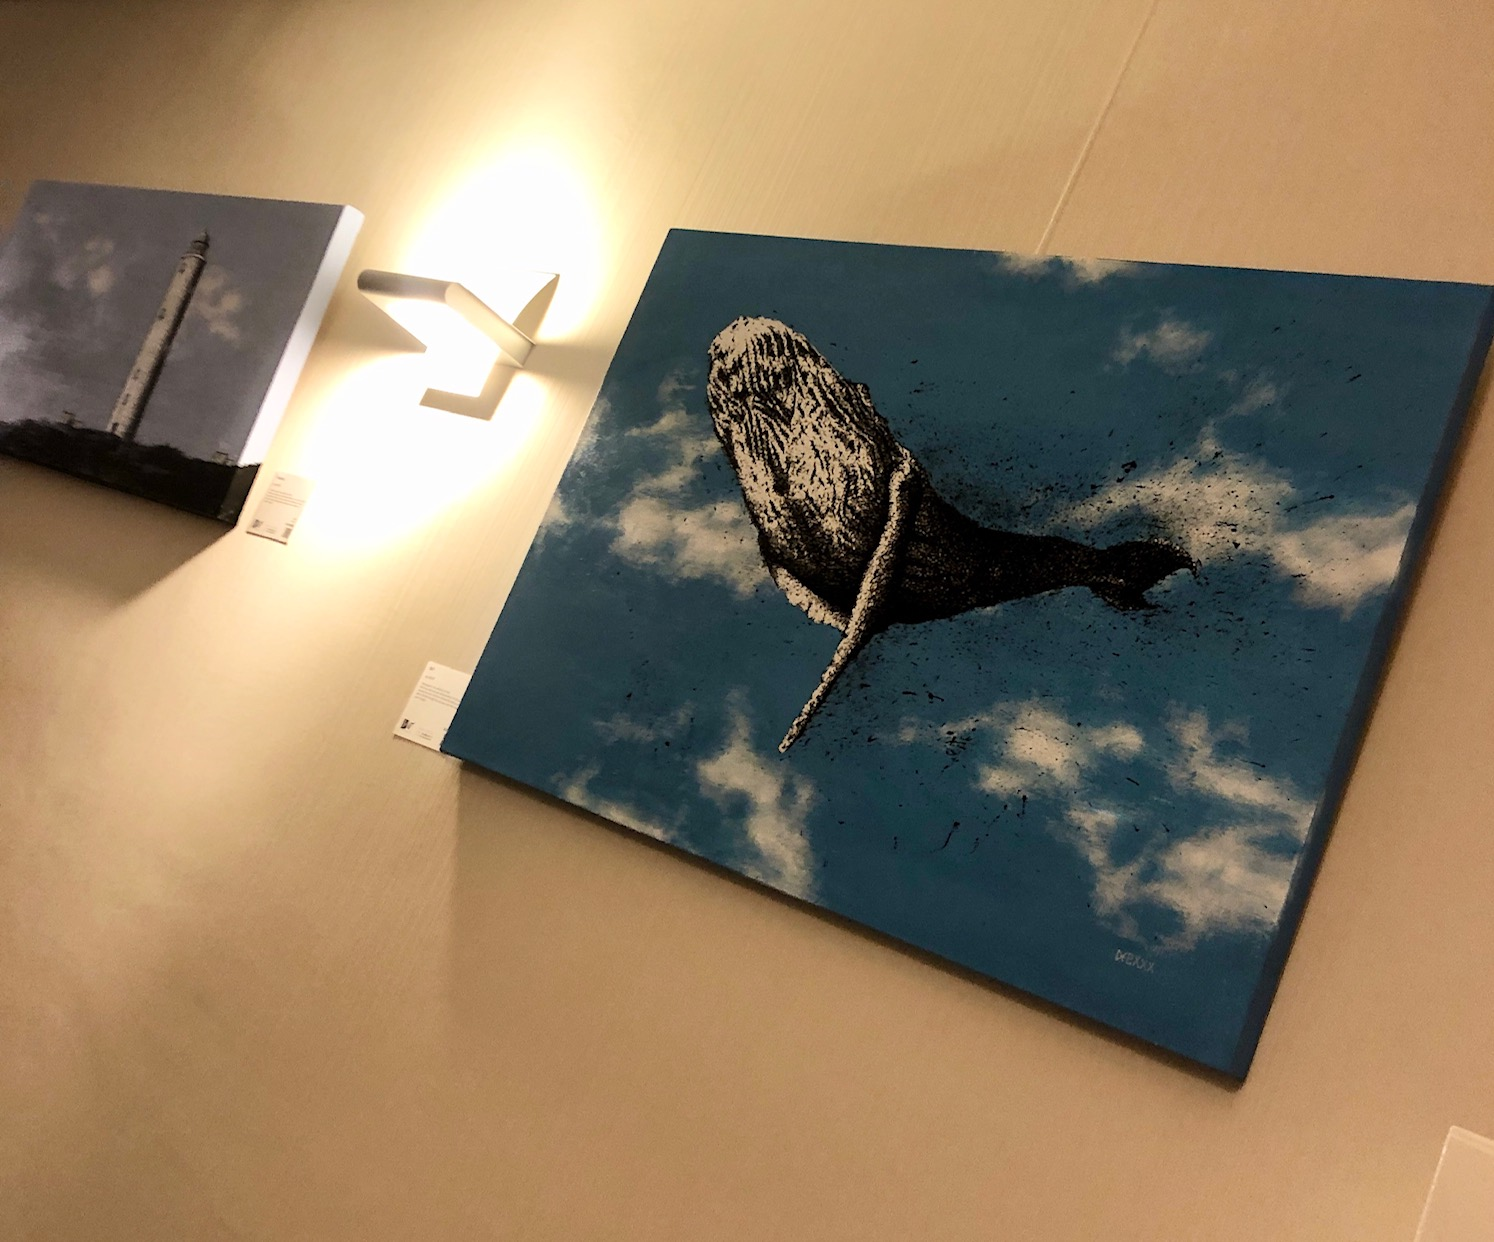 teletransport, the solo exhibition in zandvoort